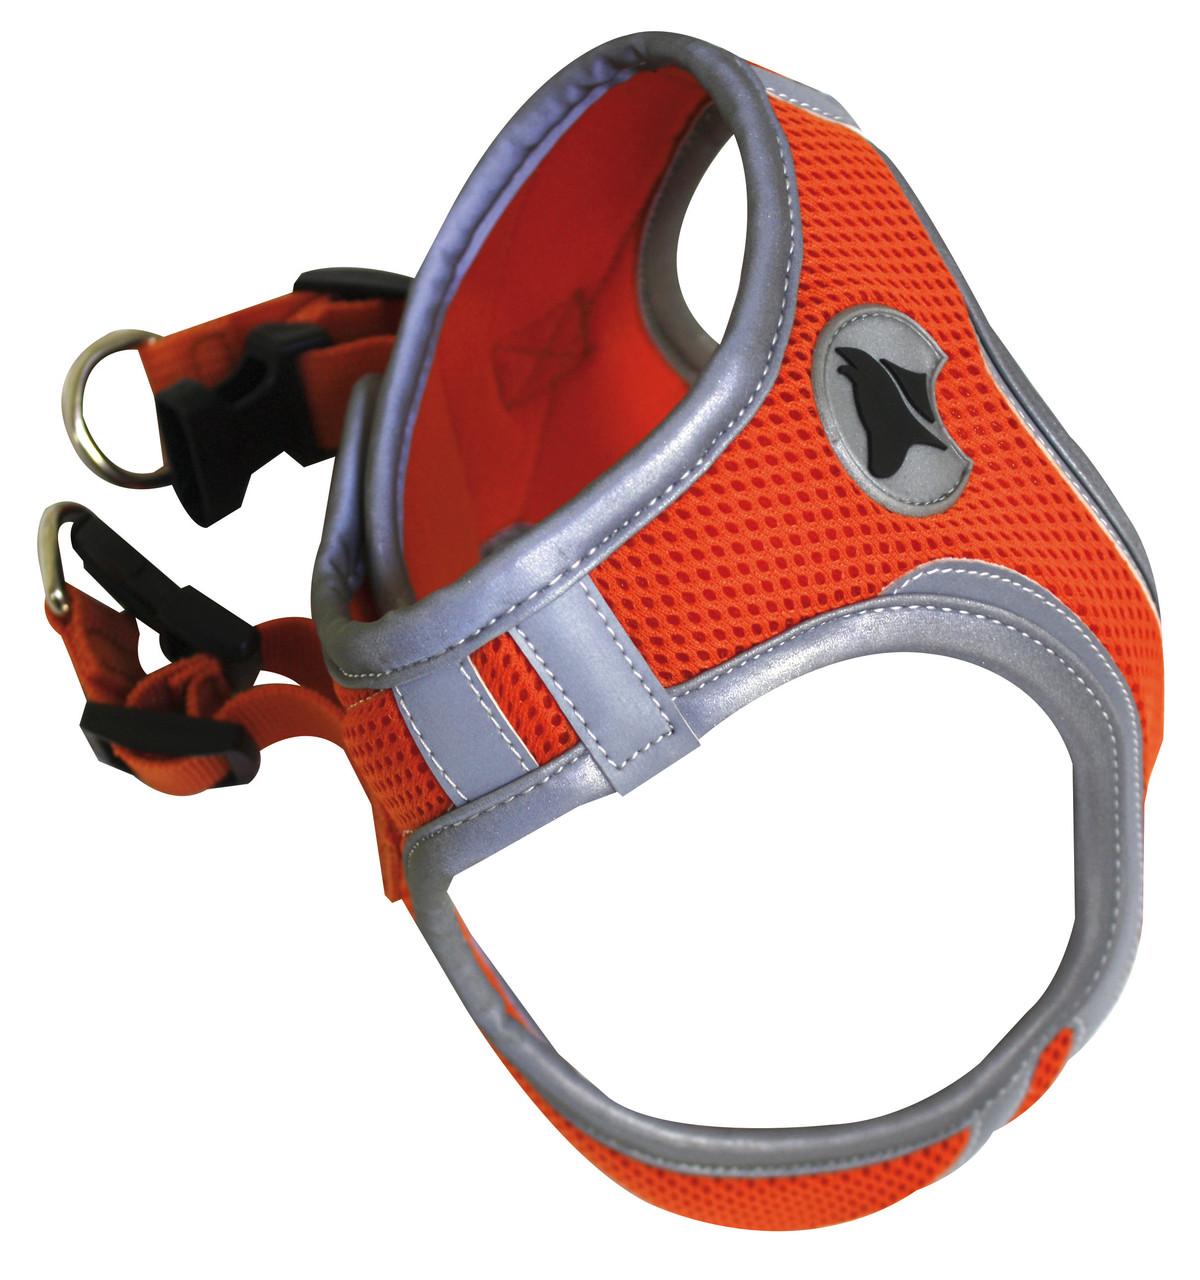 Шлея для собак 53-58 см HIKING REFLECTIVE. Оранжевая, нейлон, XL